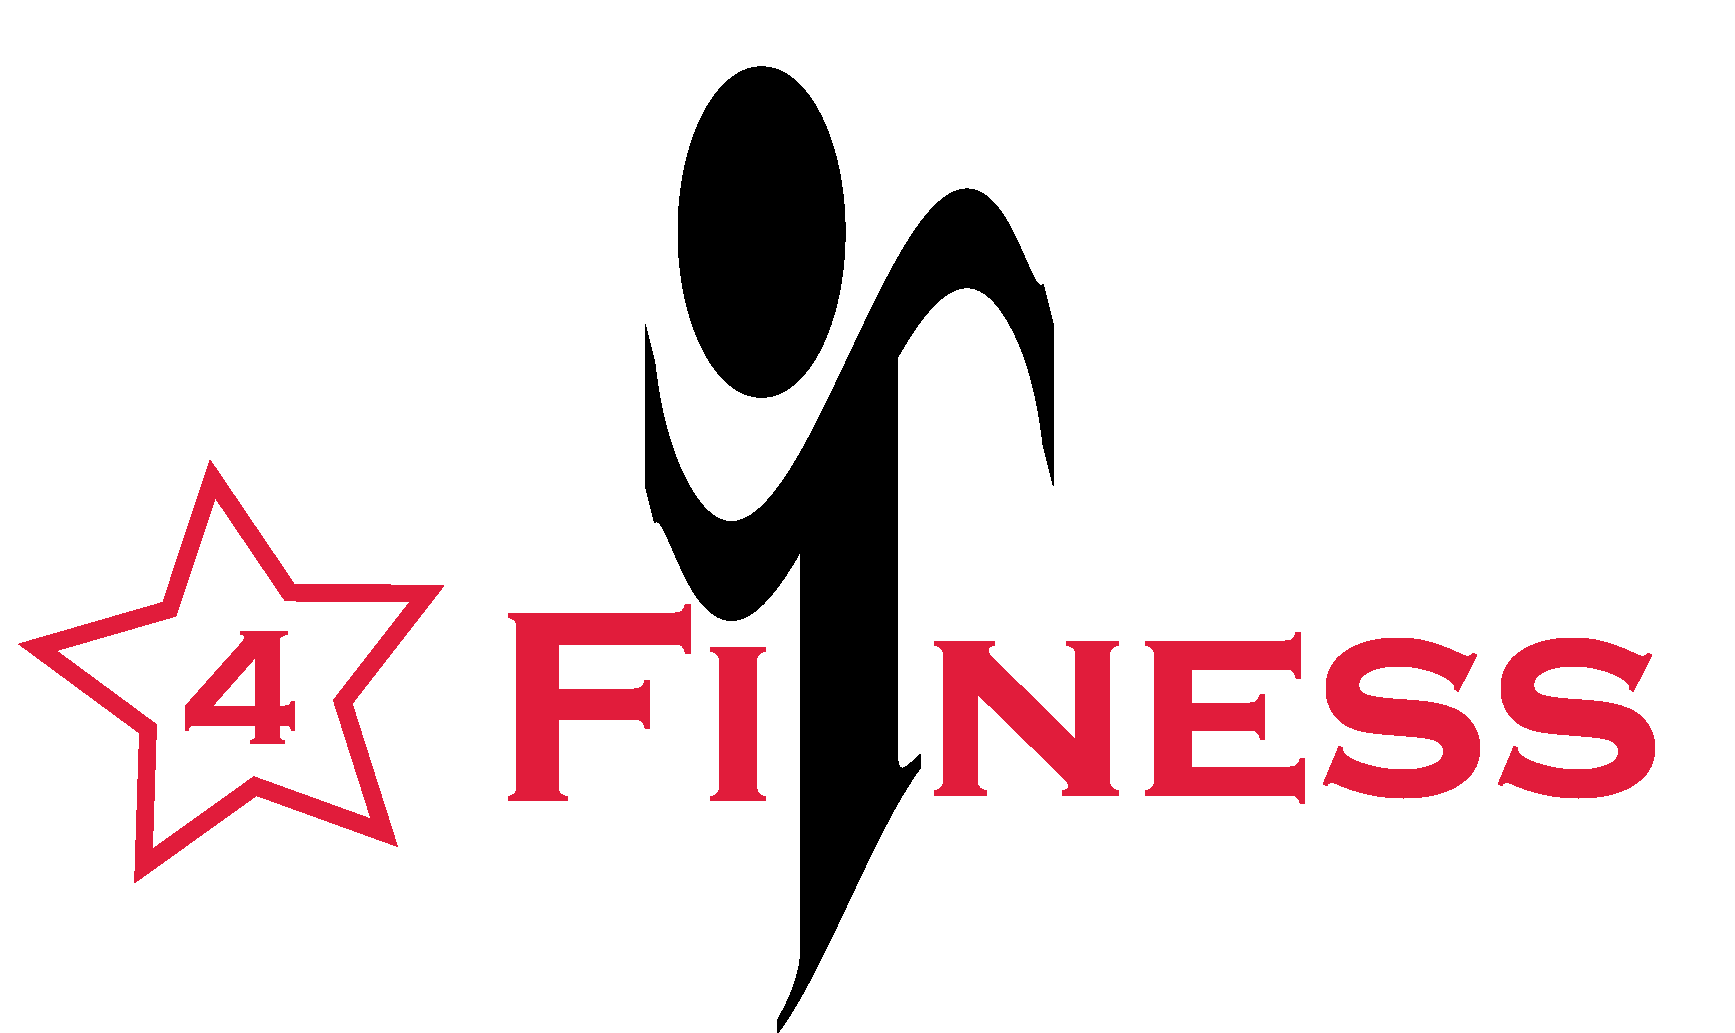 4Star Fitness